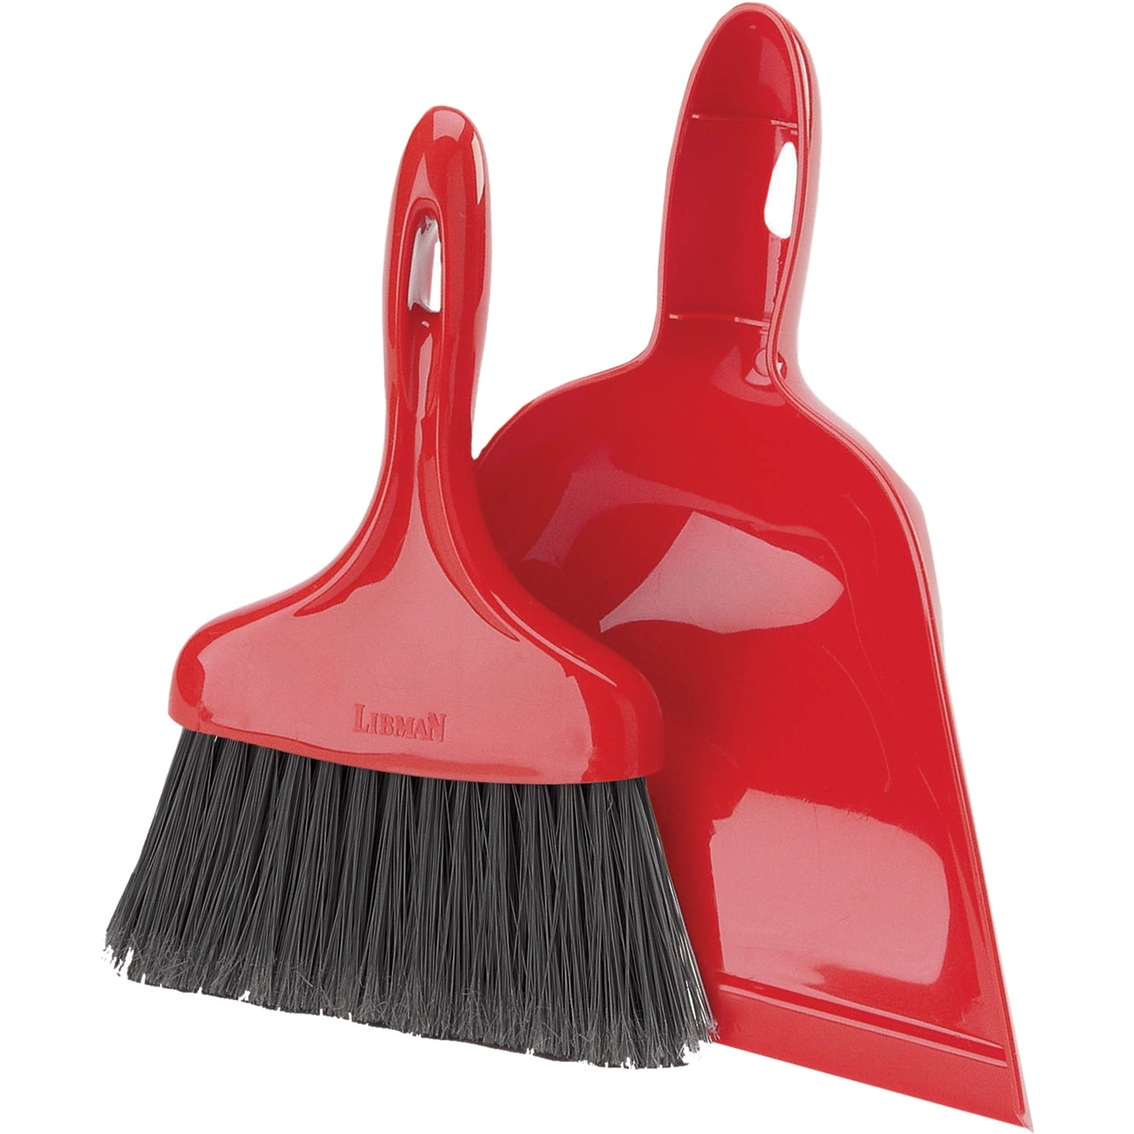 Libman Dust Pan With Whisk Broom Garage Cleaning Patio Garden Garage Shop The Exchange